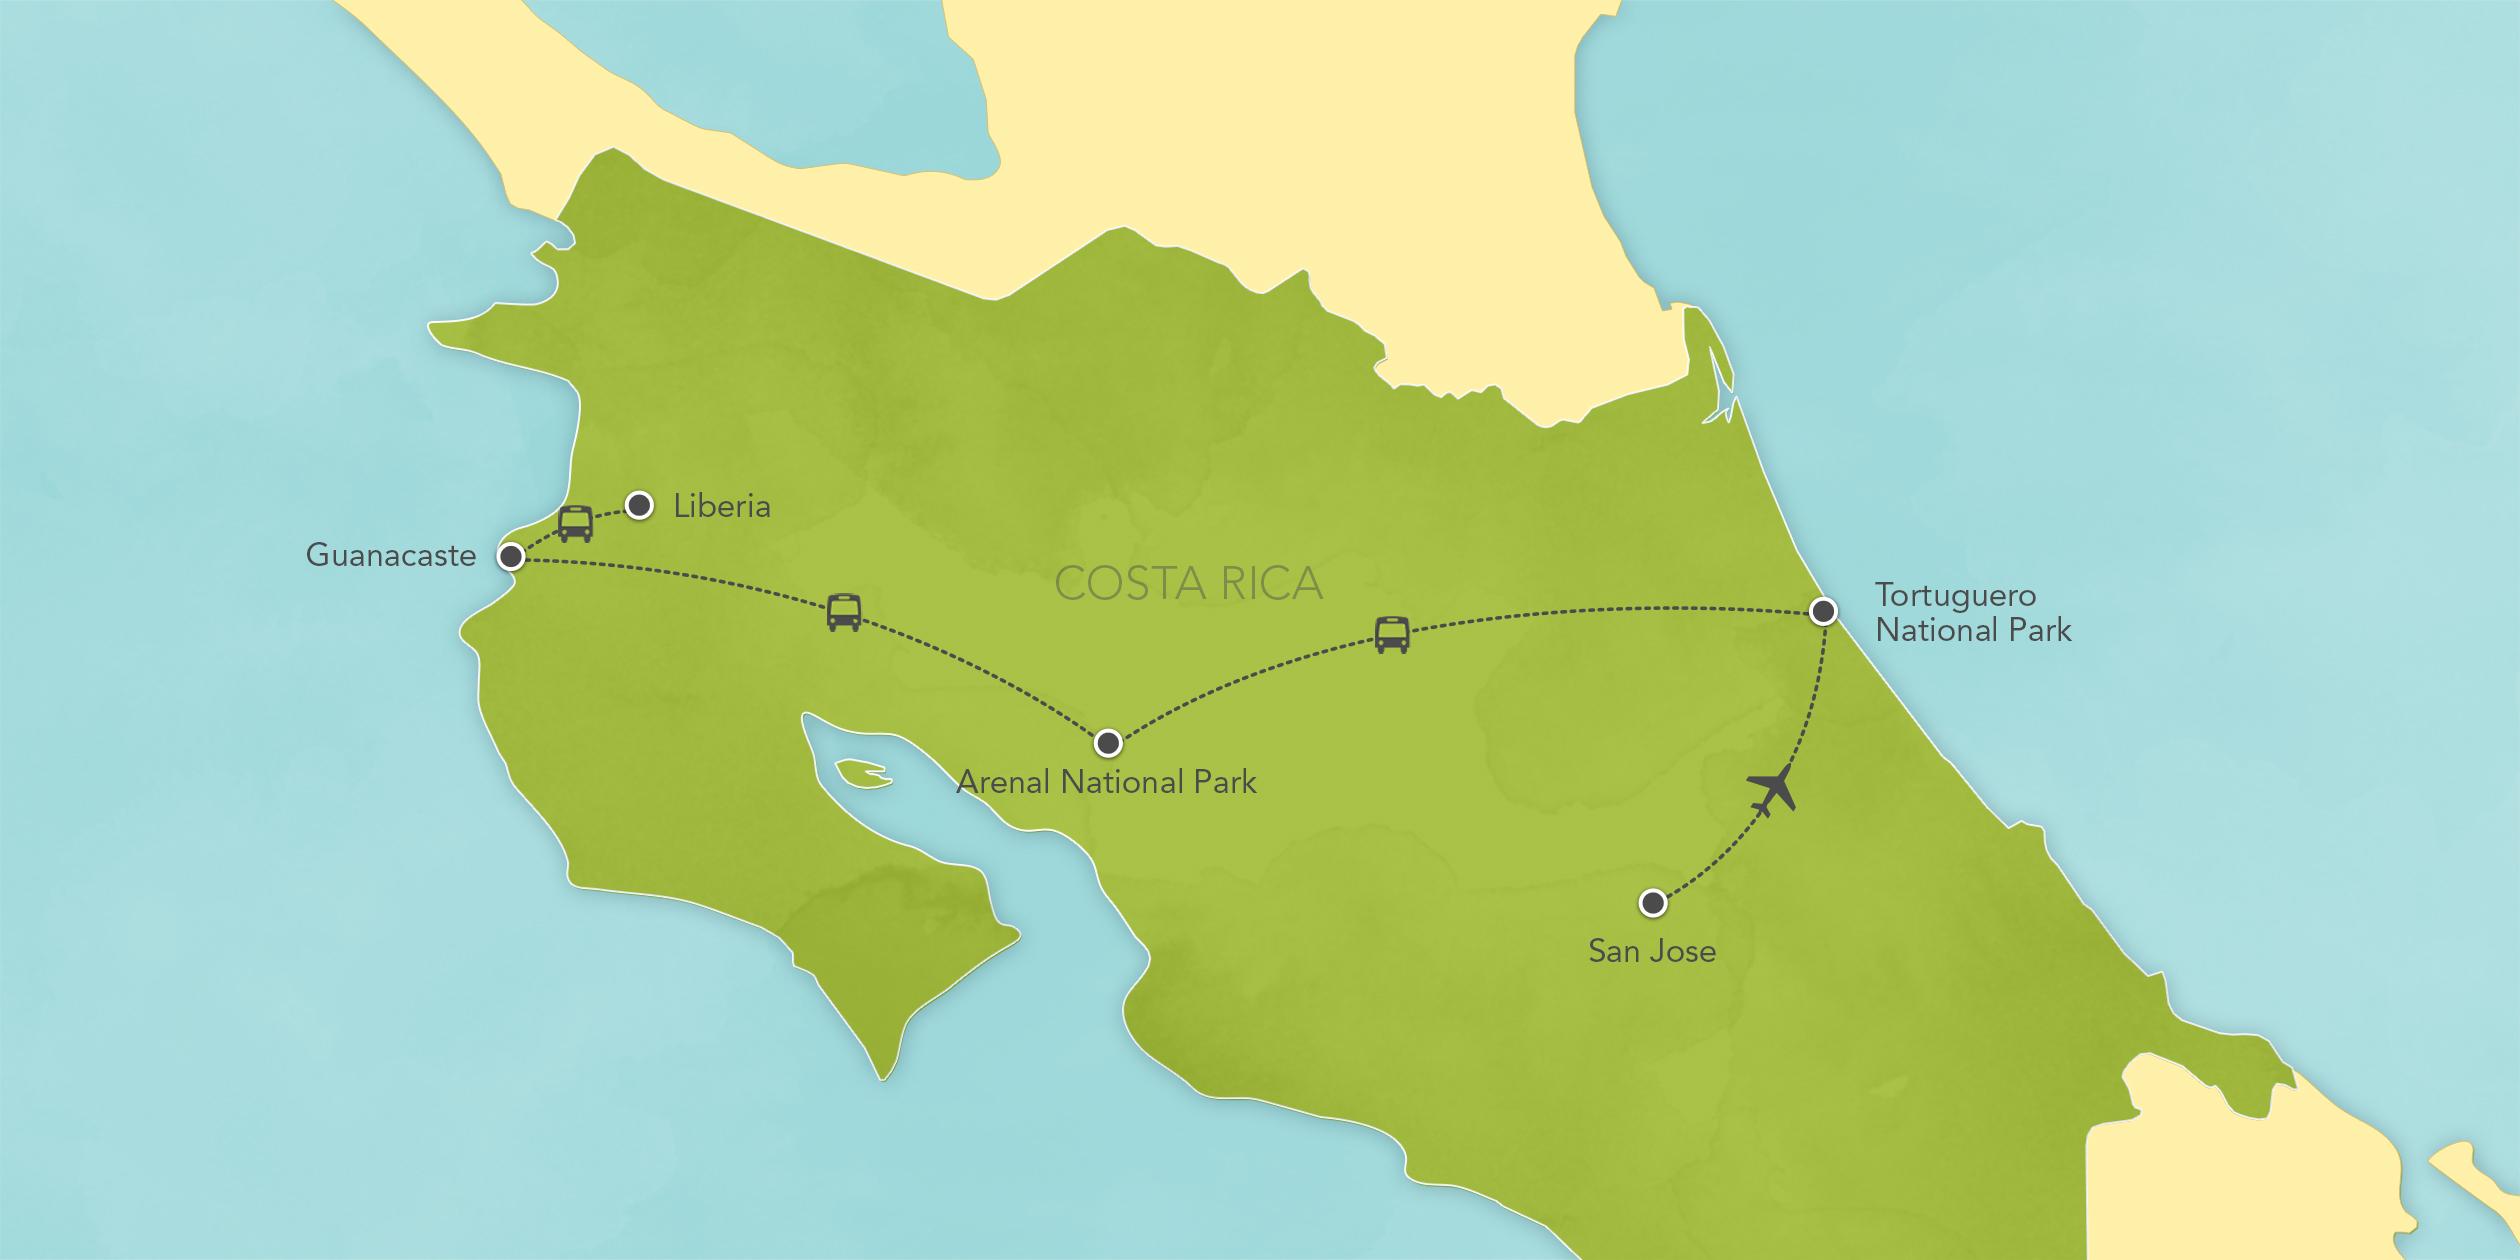 Itinerary map of Costa Rica: Tortuguero, Arenal, Guanacaste, San José 2018